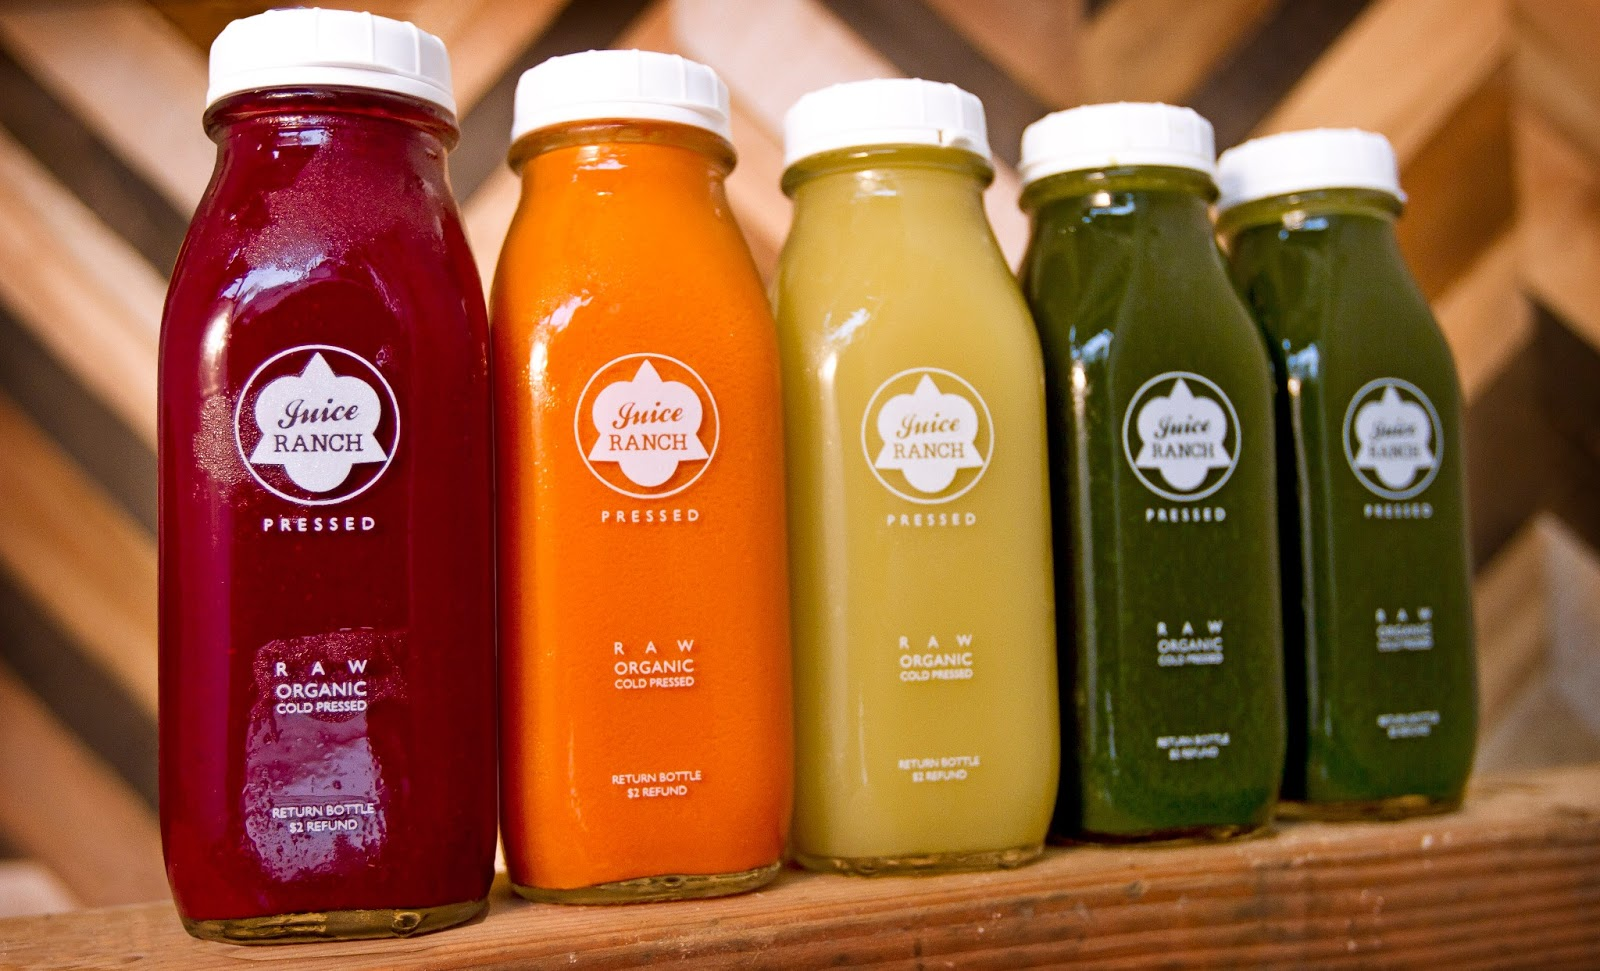 Juice ranch natalie notions for Adama vegan comfort cuisine